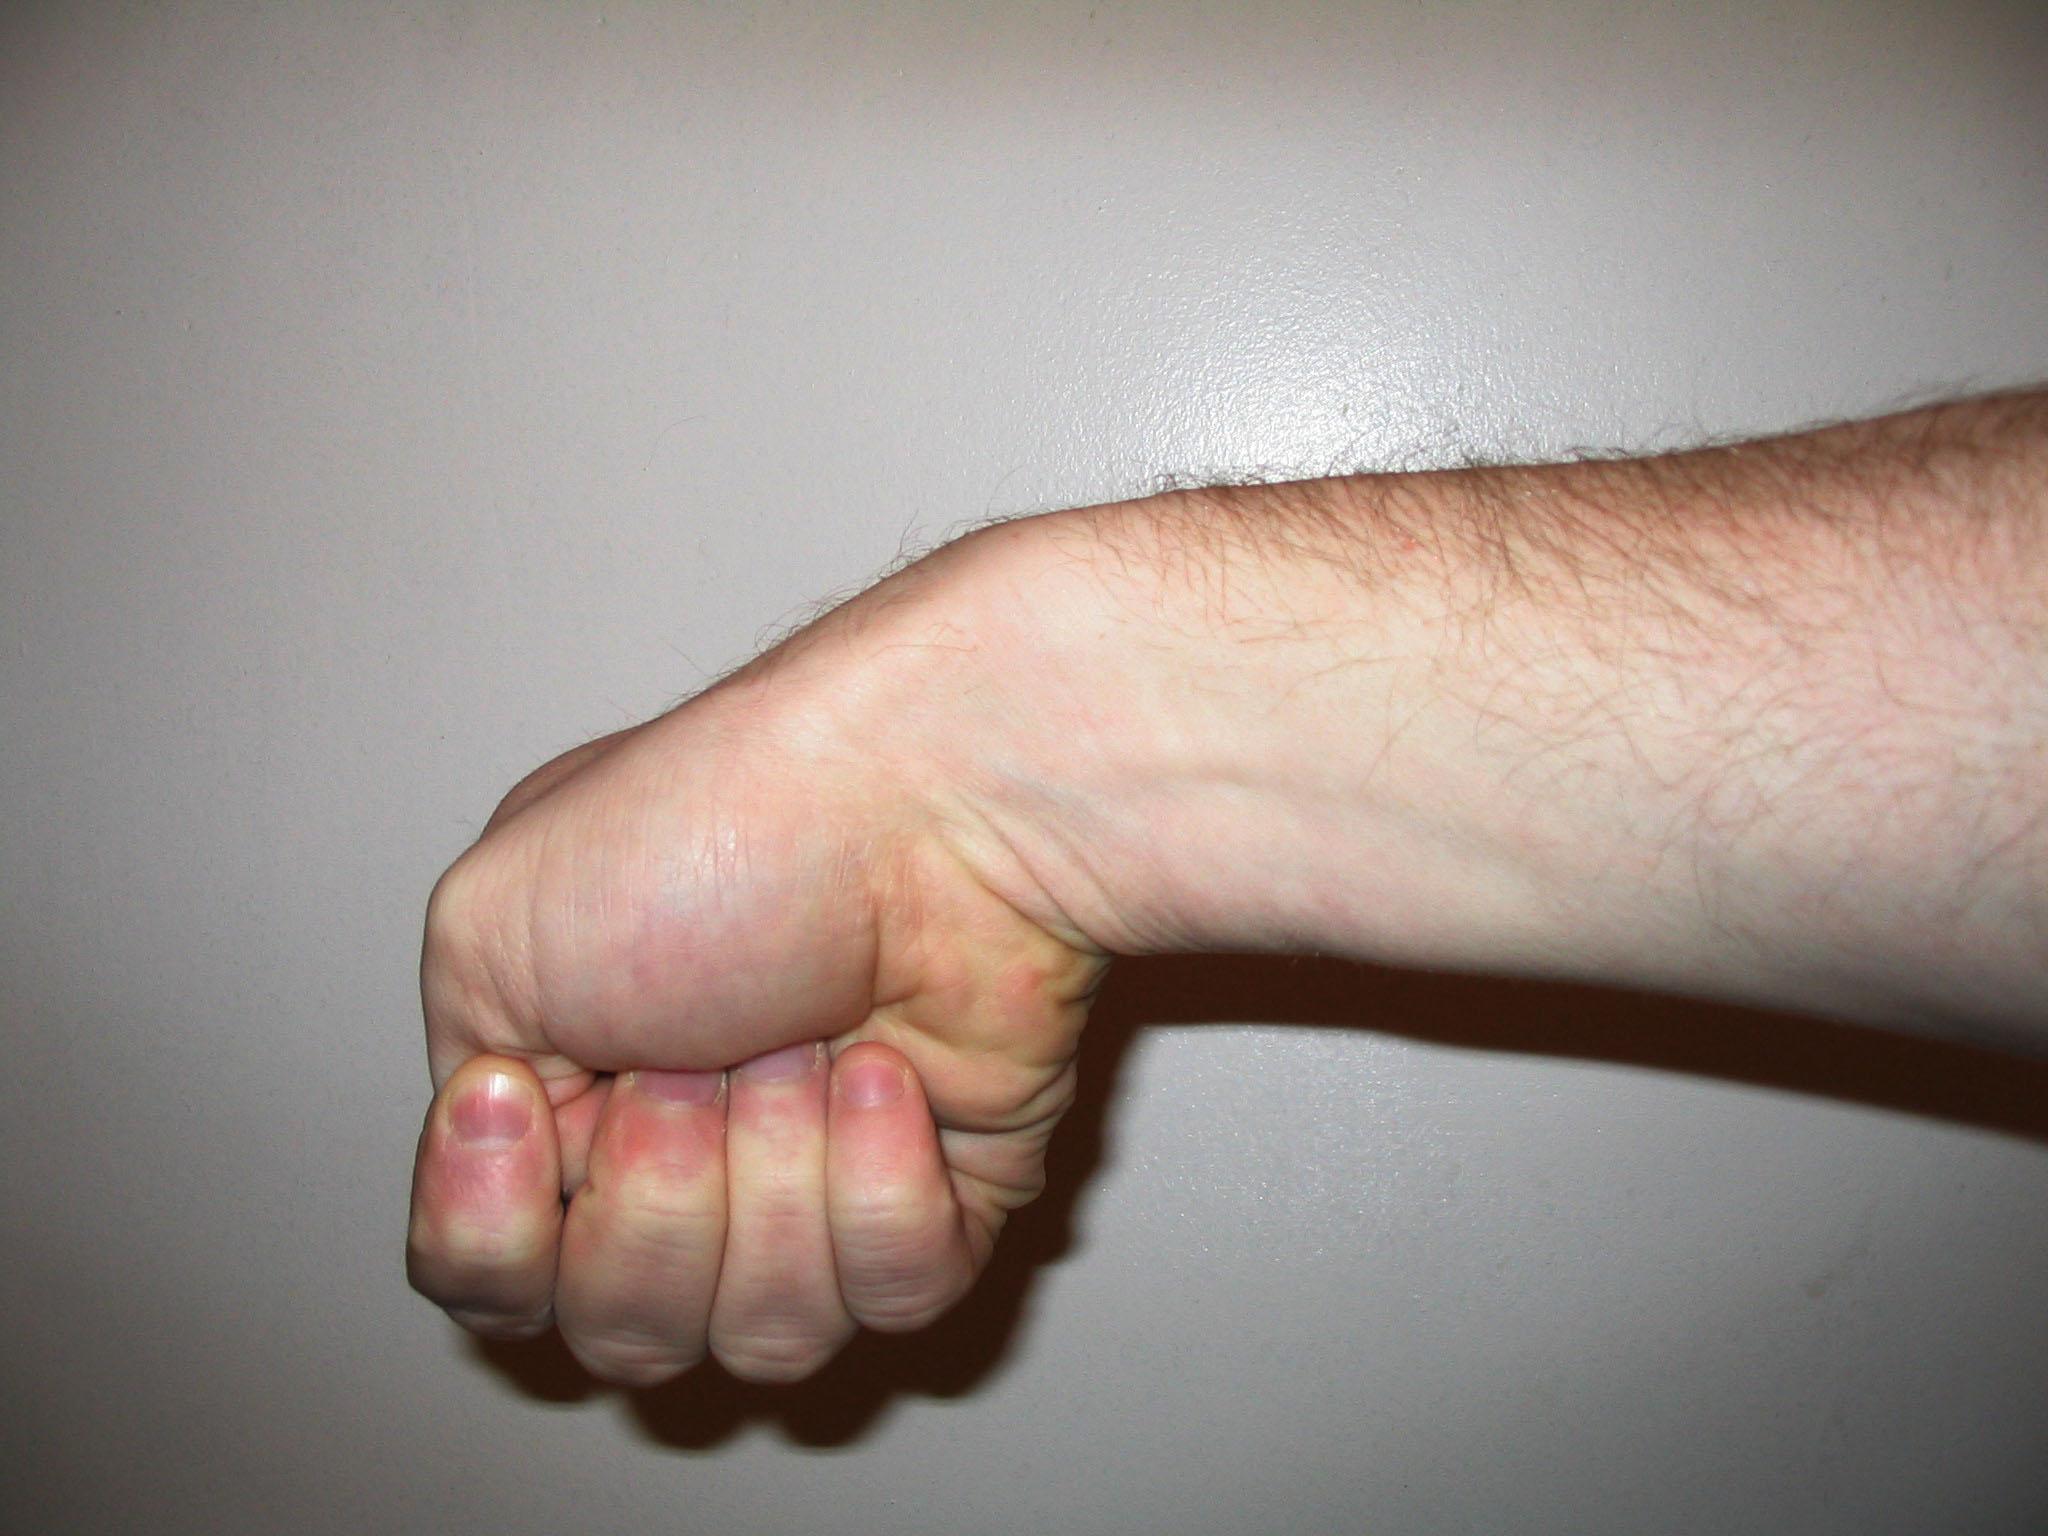 растянутая рука фото